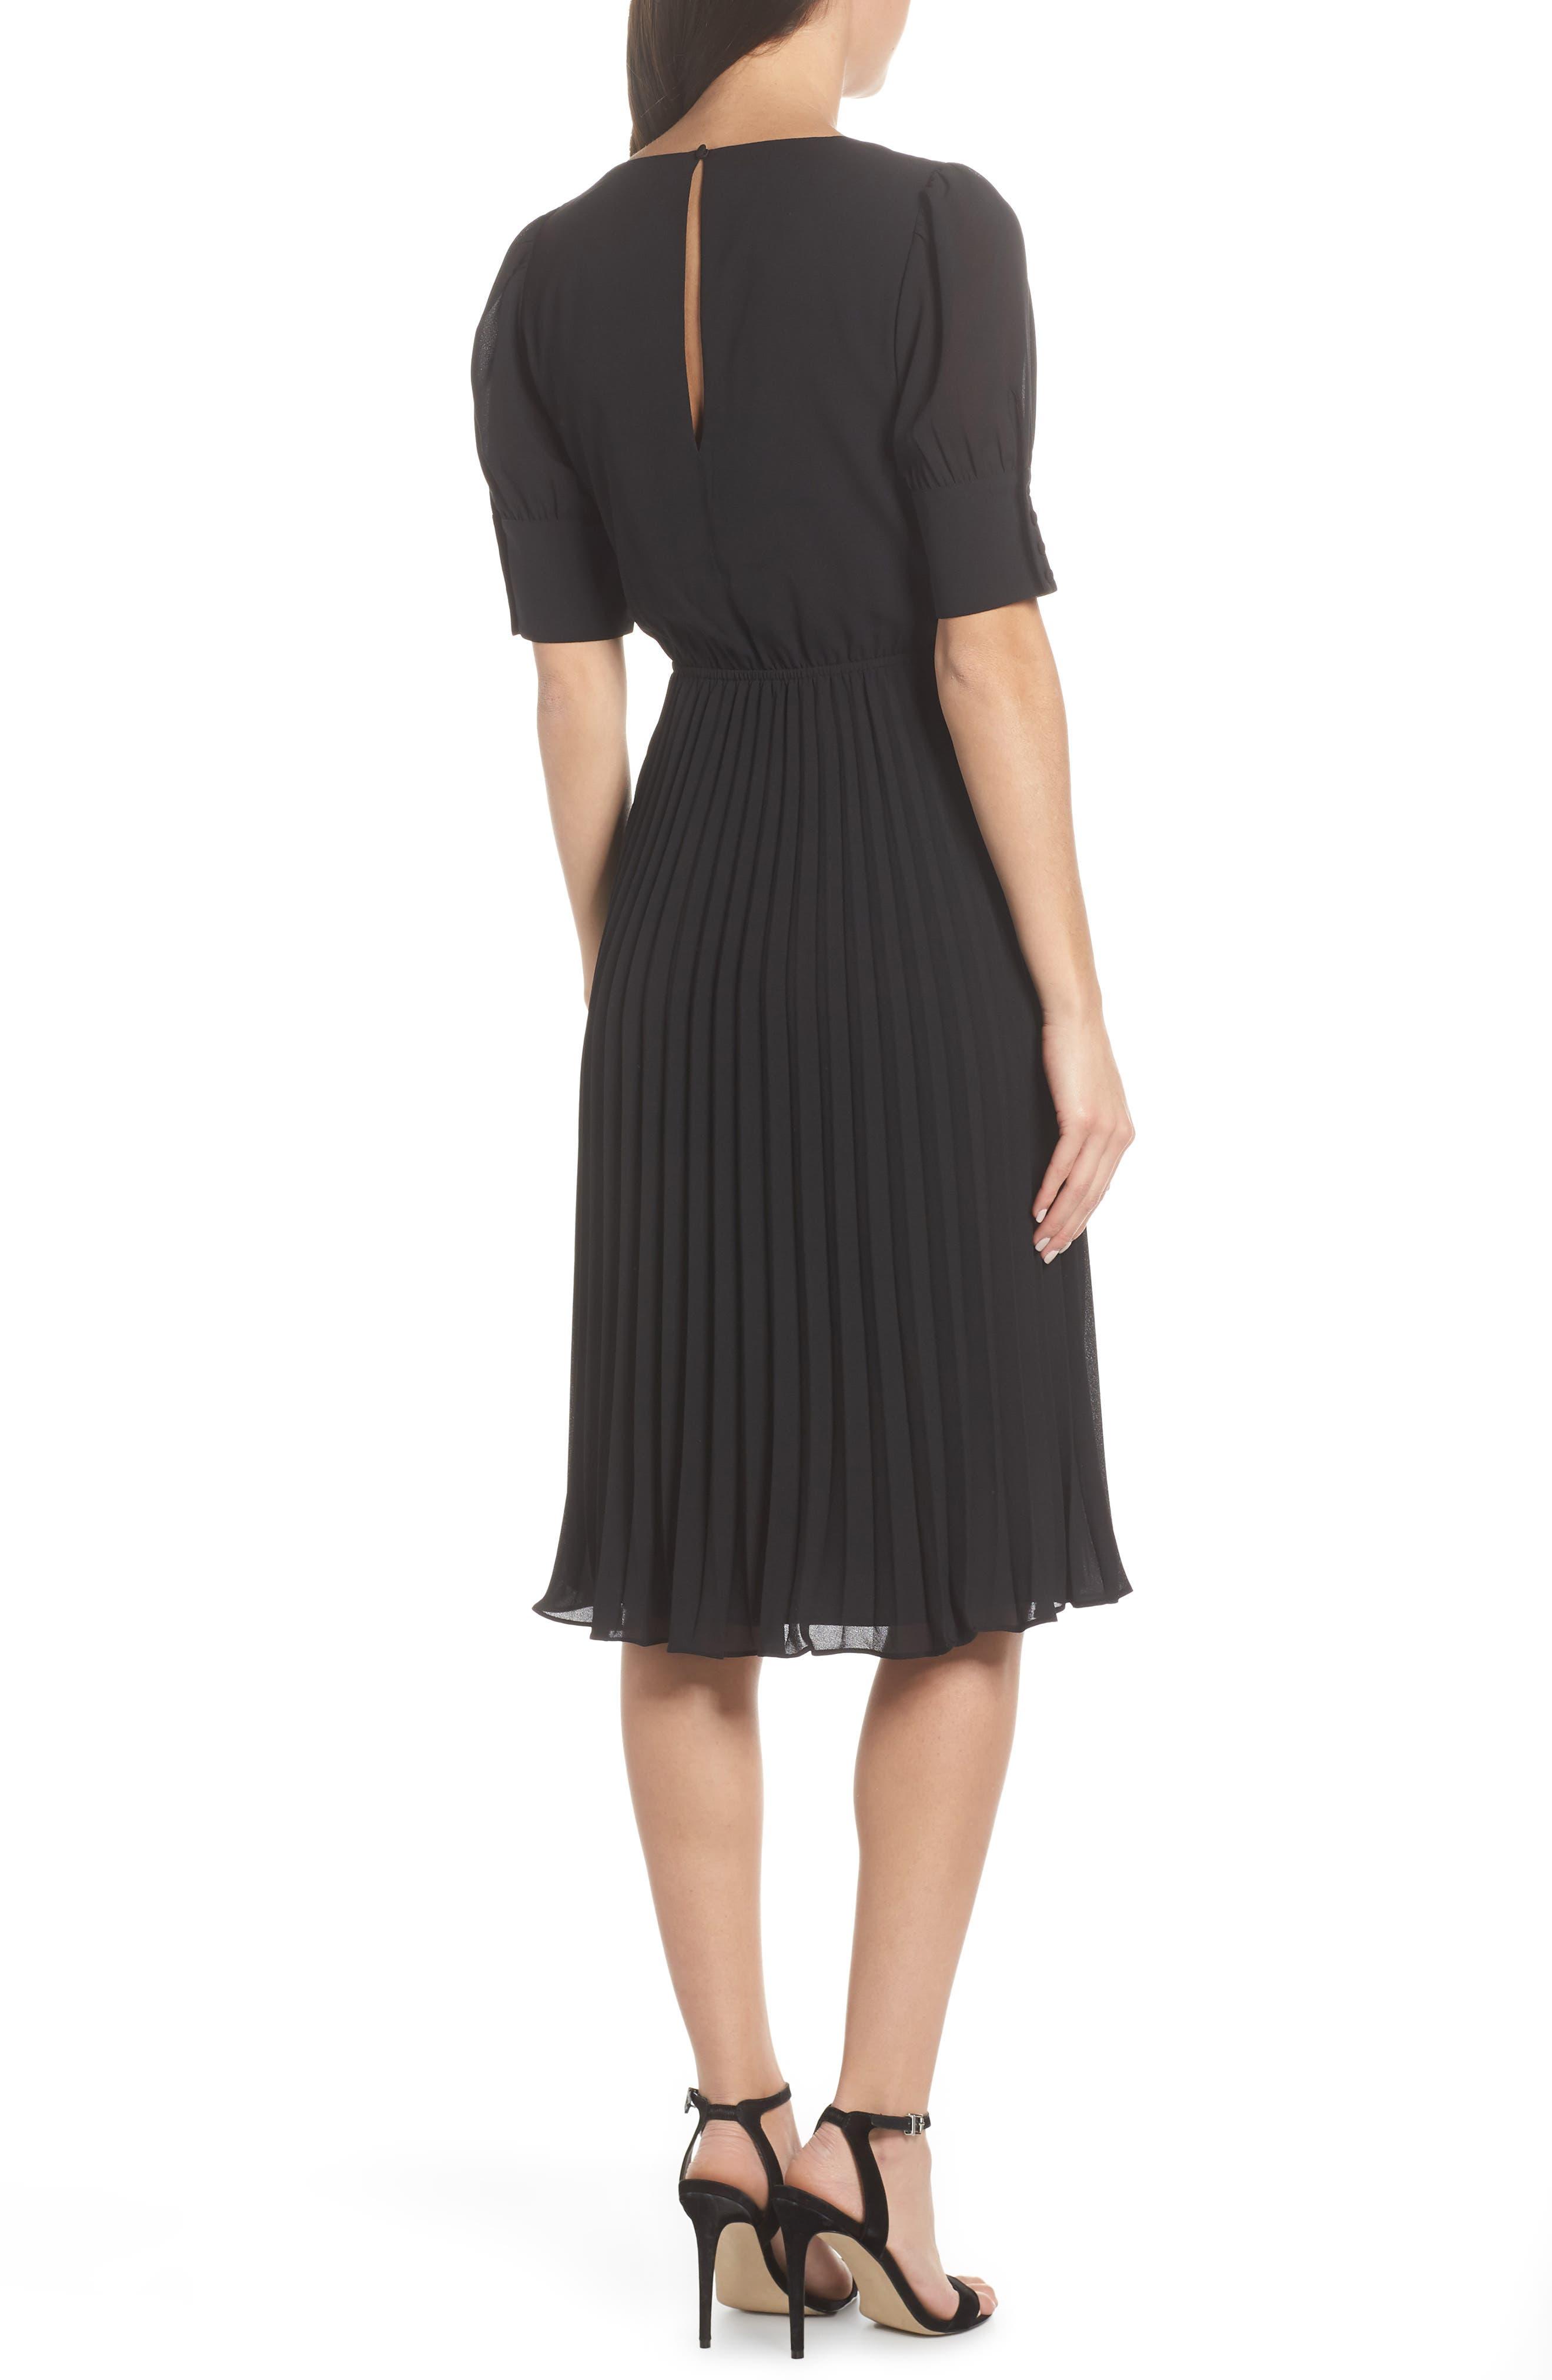 ALI & JAY, Angles Flight Chiffon Fit & Flare Dress, Alternate thumbnail 2, color, BLACK